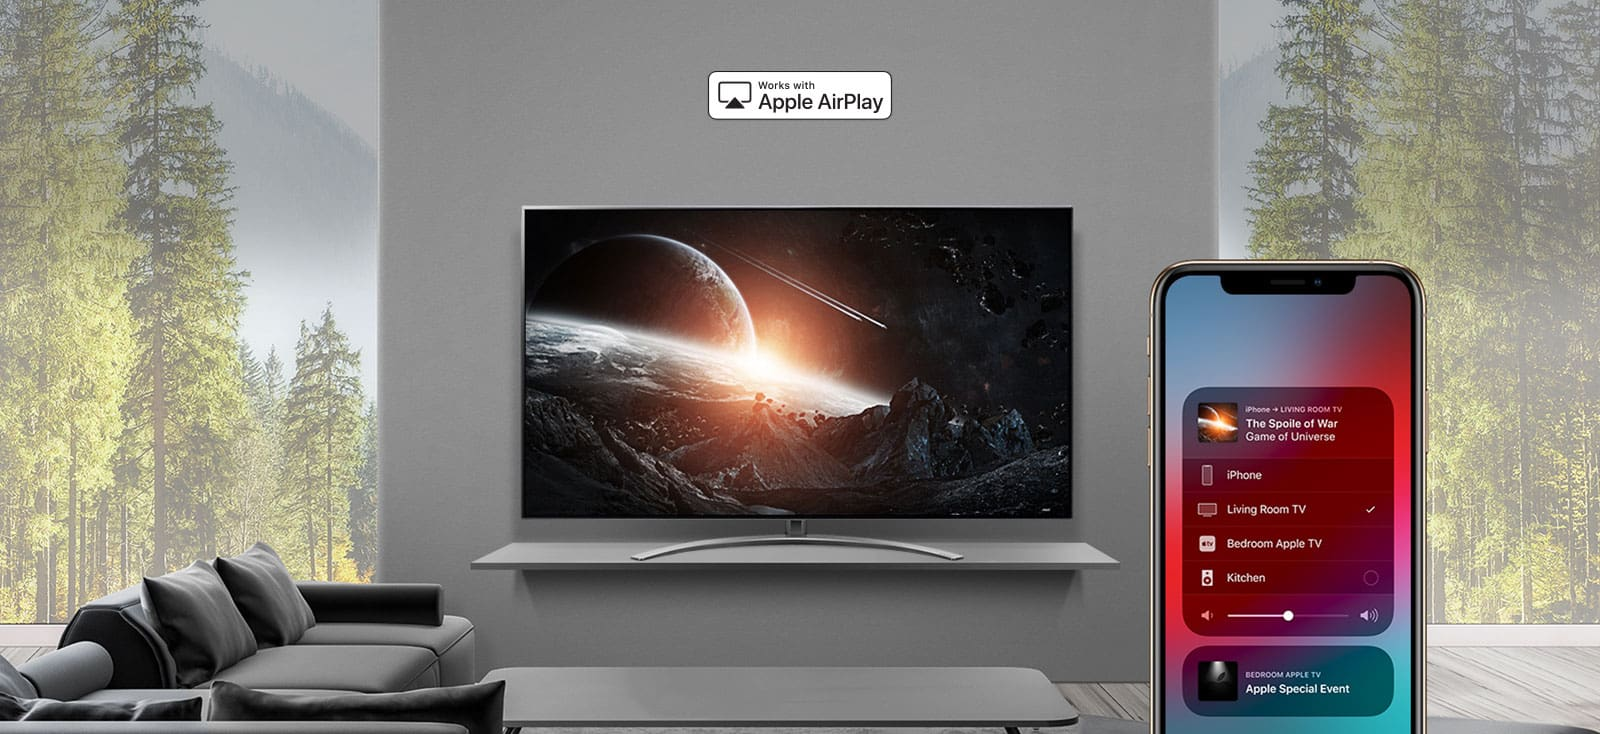 قیمت تلویزیون 55 اینج ال جی مدل 55SM9500